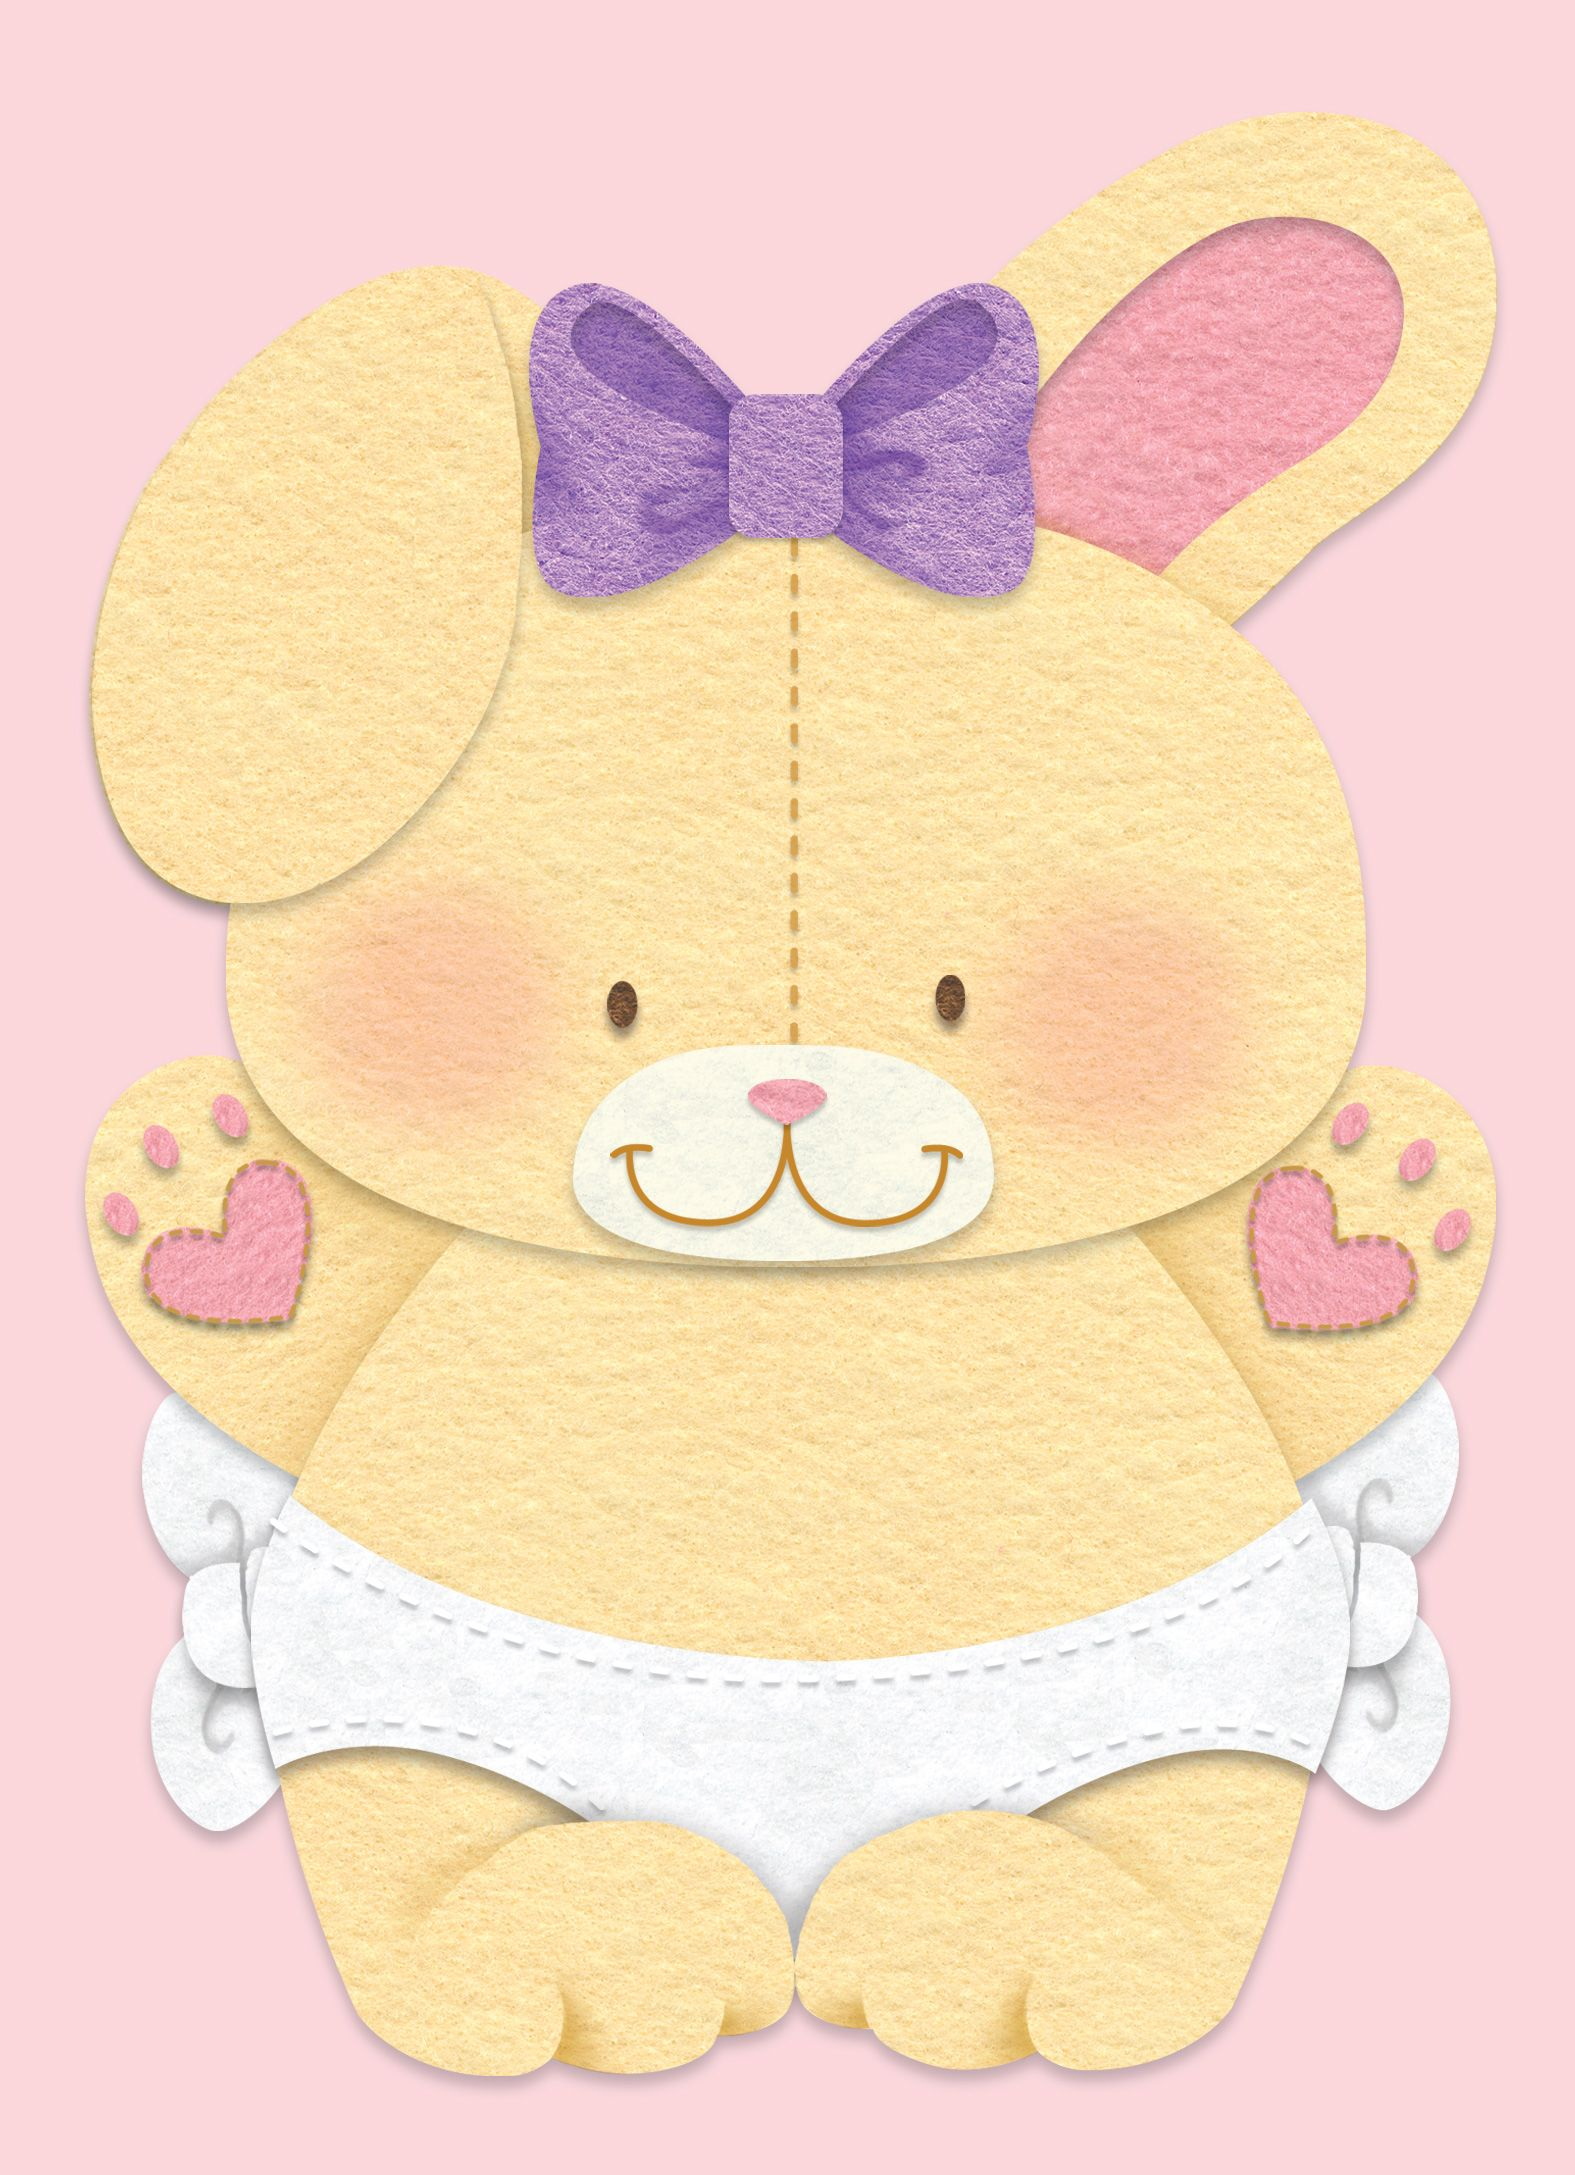 New baby bear hugs baby greetings gifts pinterest new baby bear hugs kristyandbryce Gallery